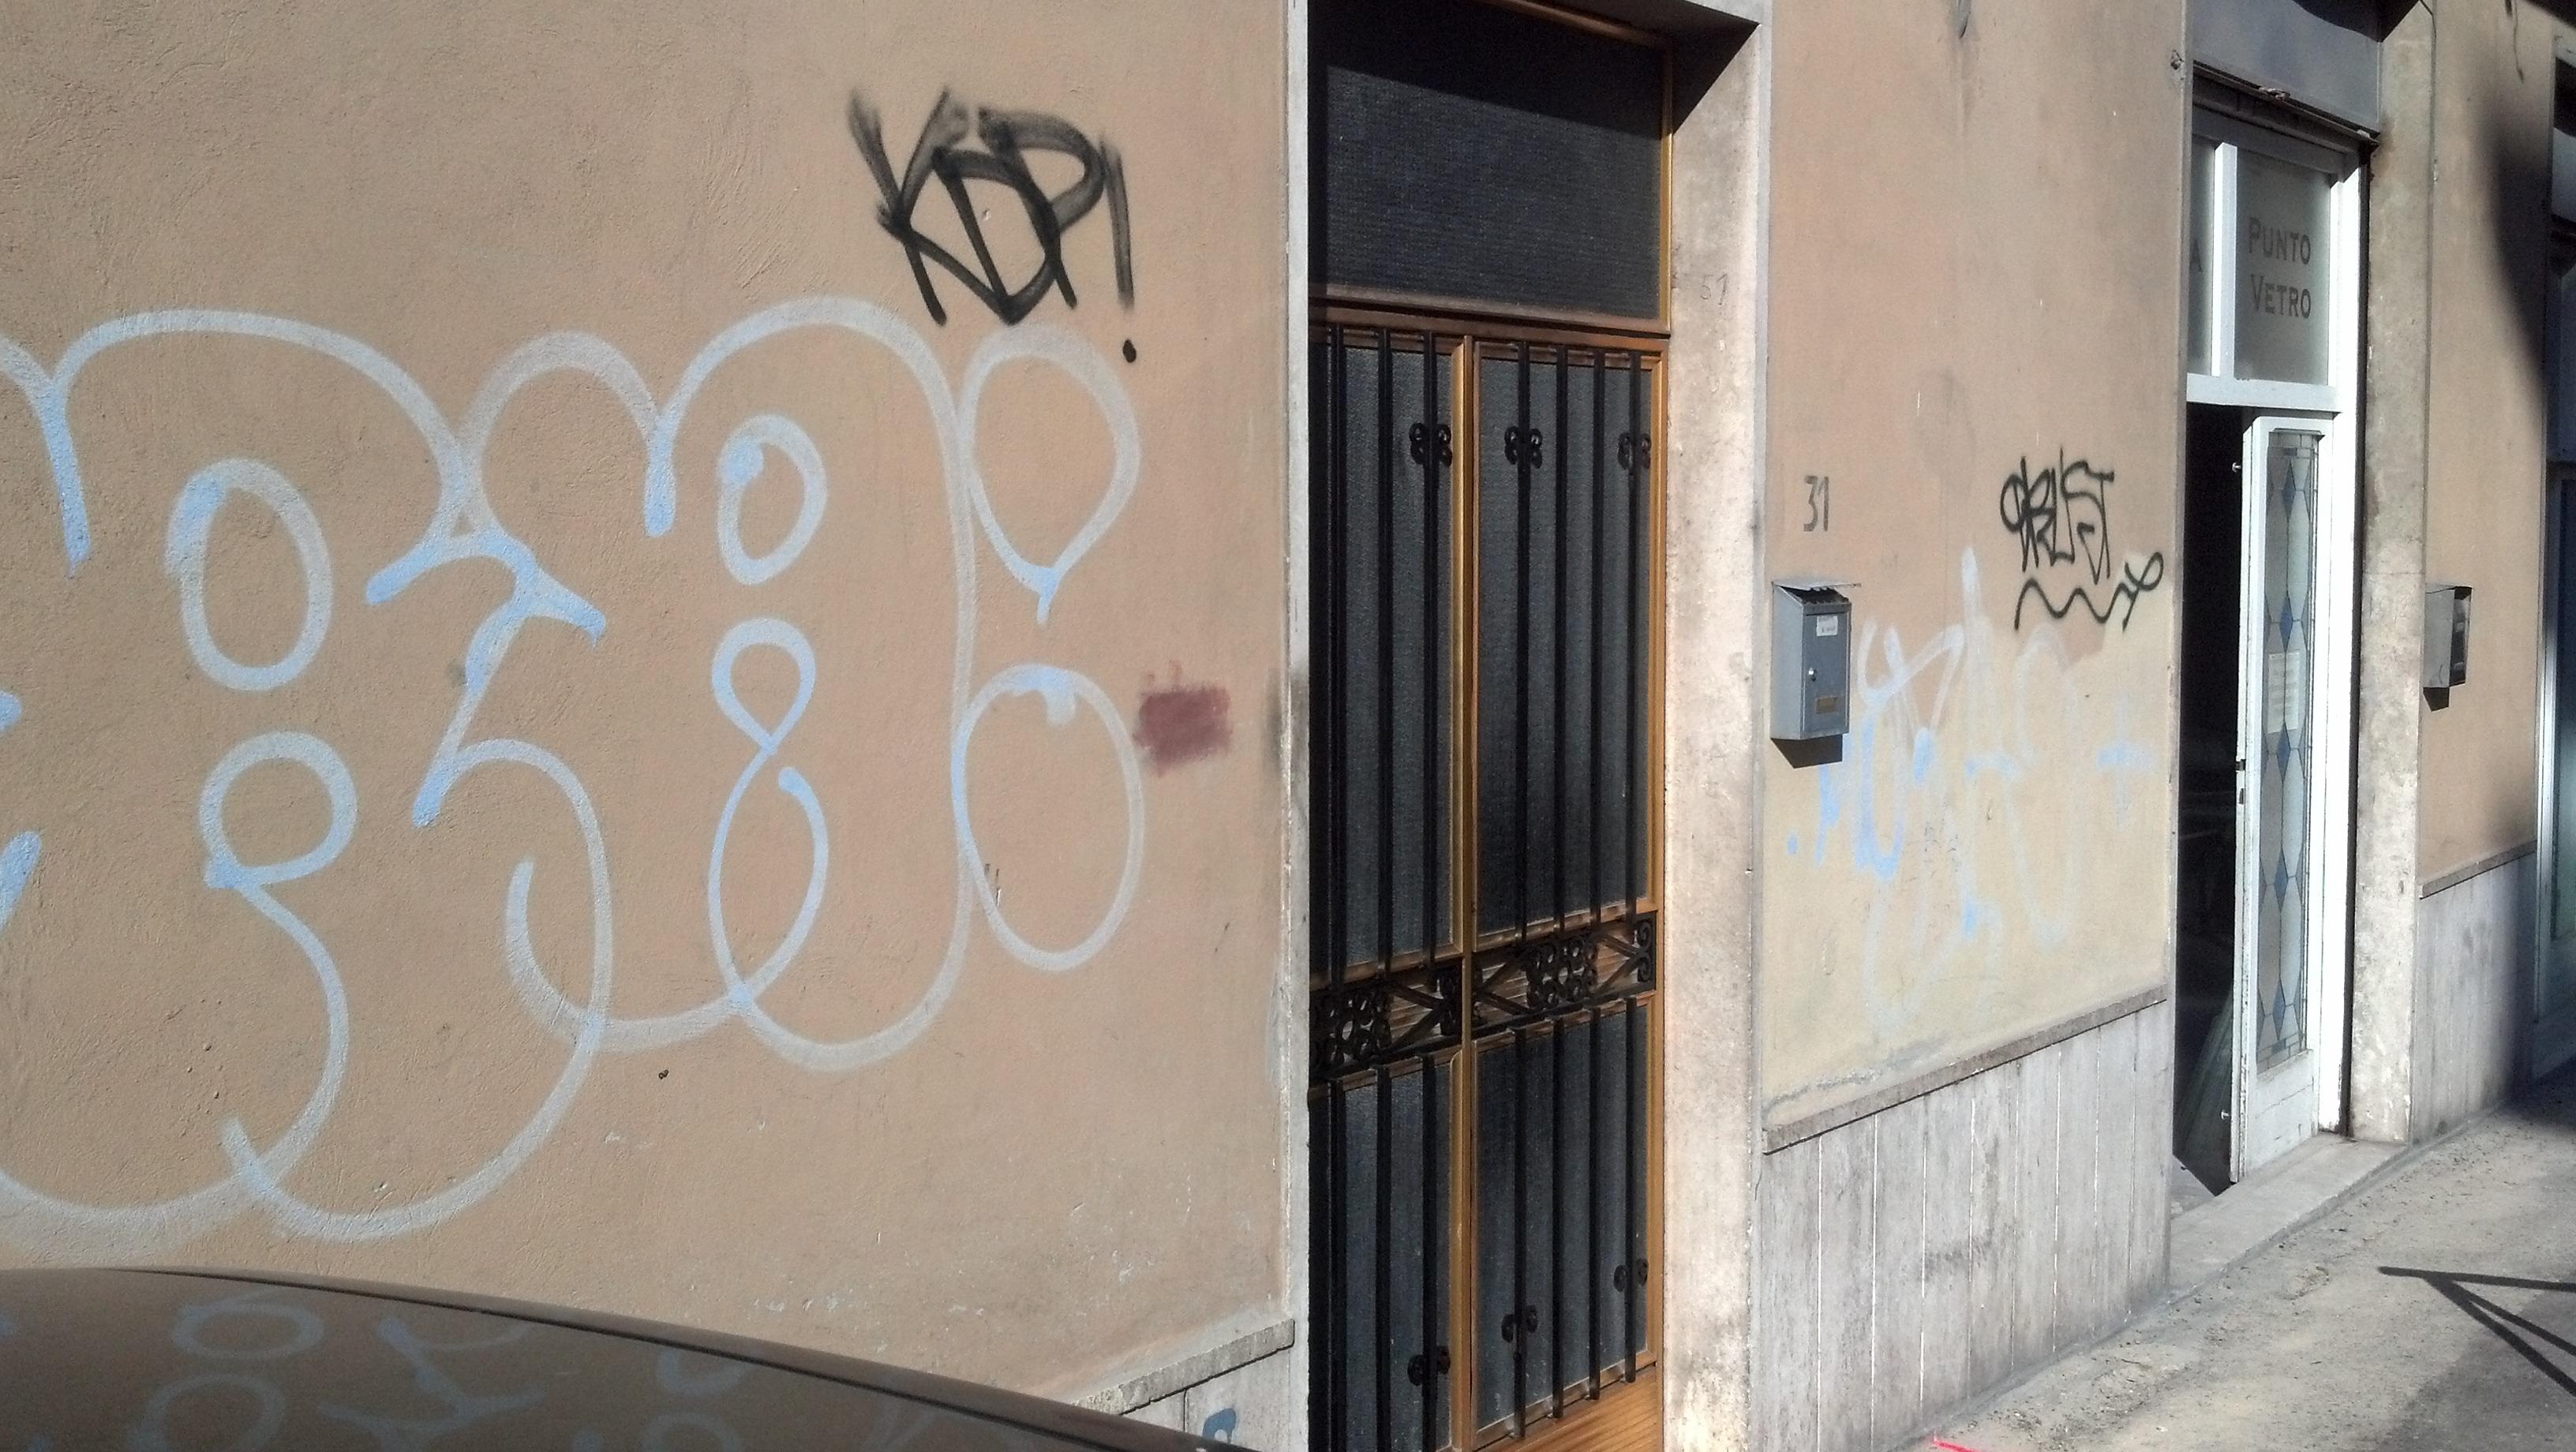 Graffiti ad Ascoli, ottobre 2012 31